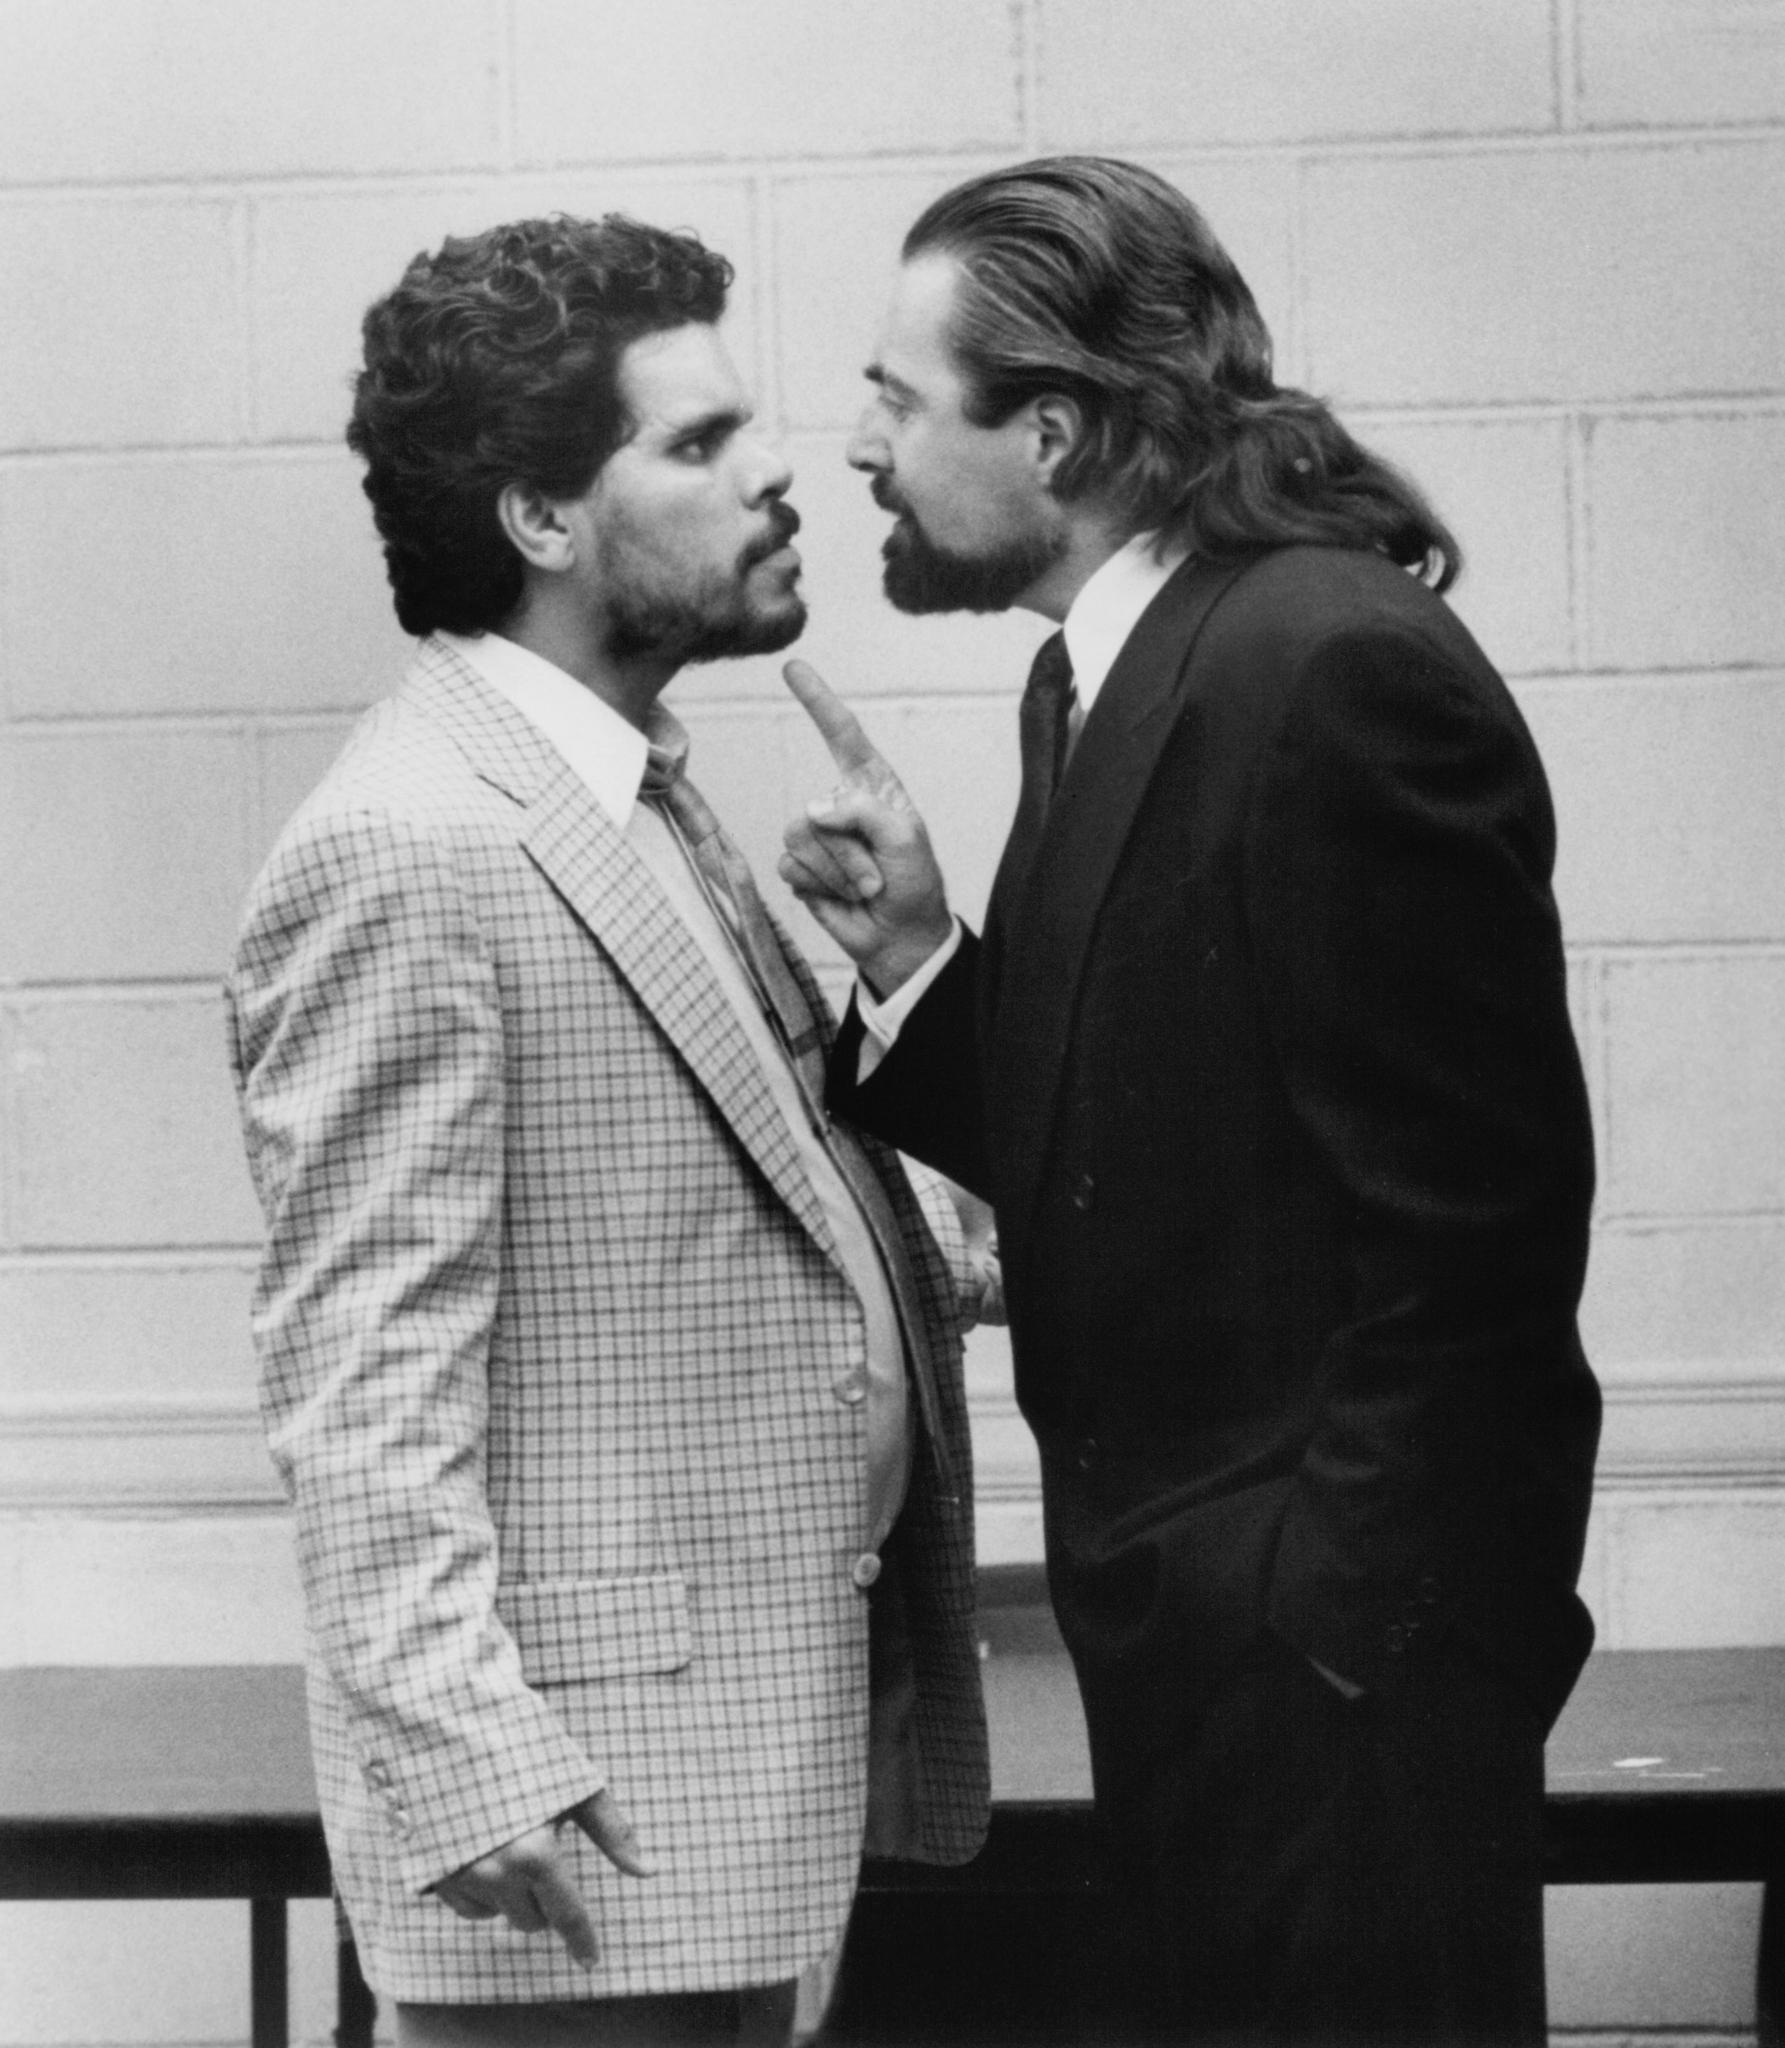 Armand Assante and Luis Guzmán in Q & A (1990)